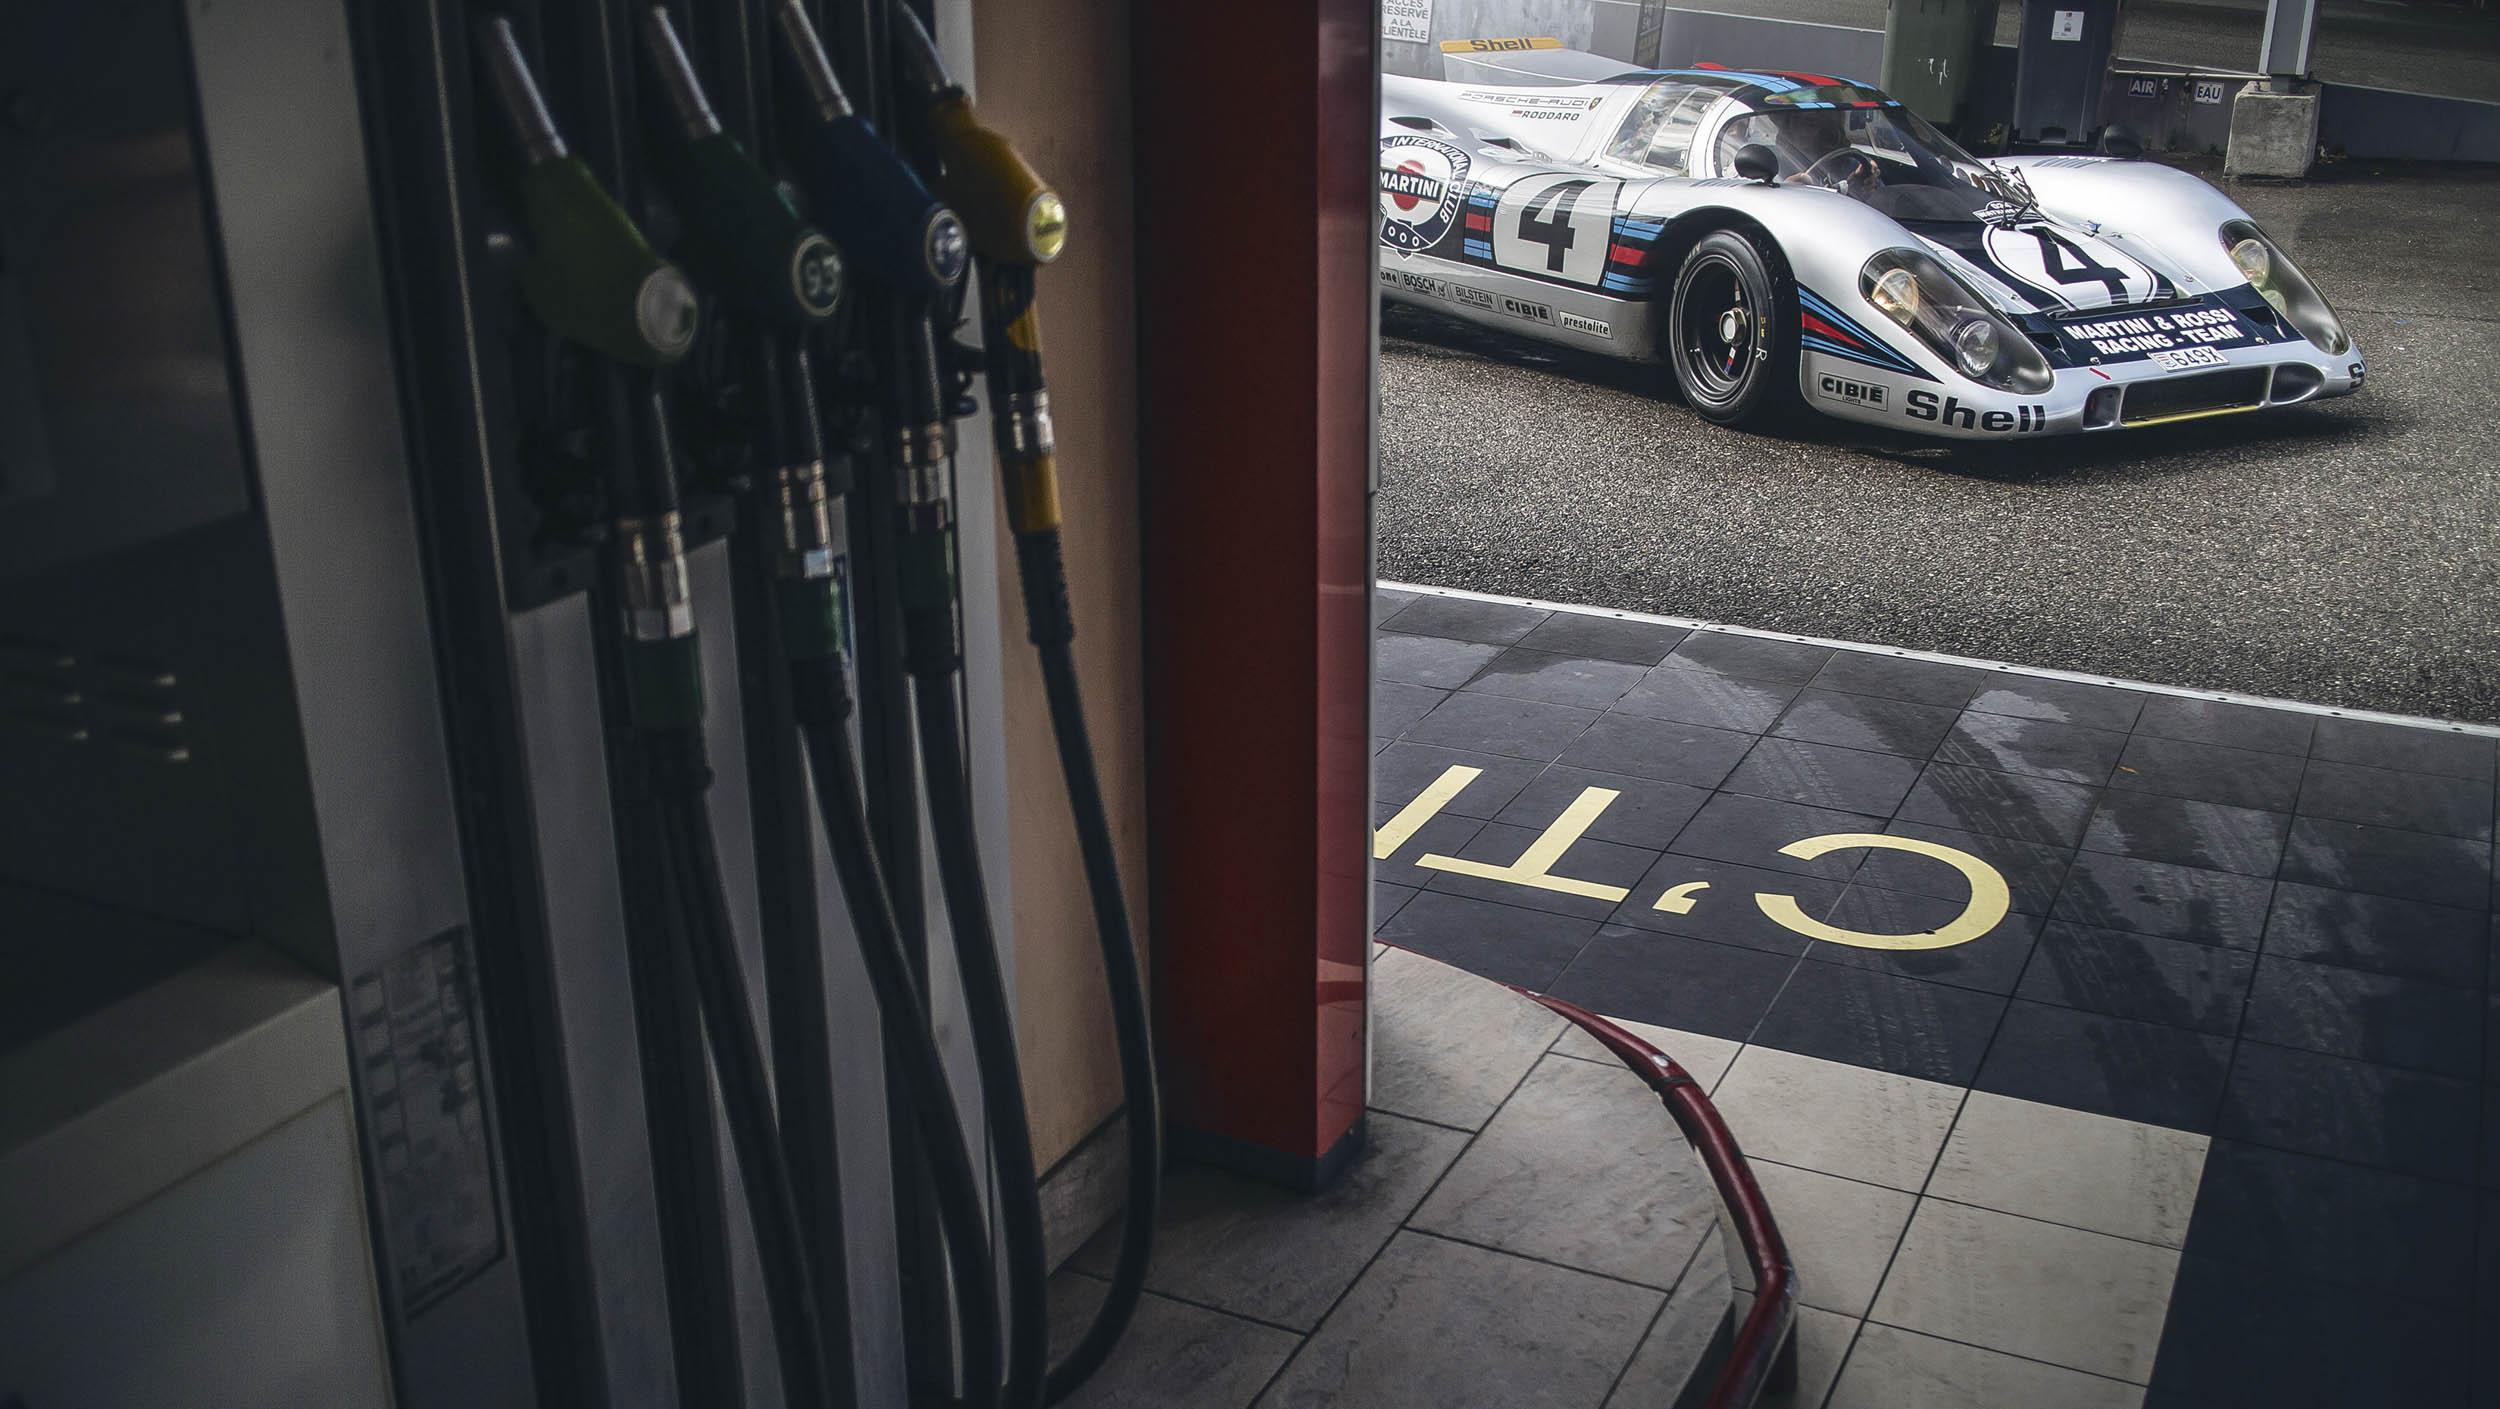 Porsche 917K at the pump